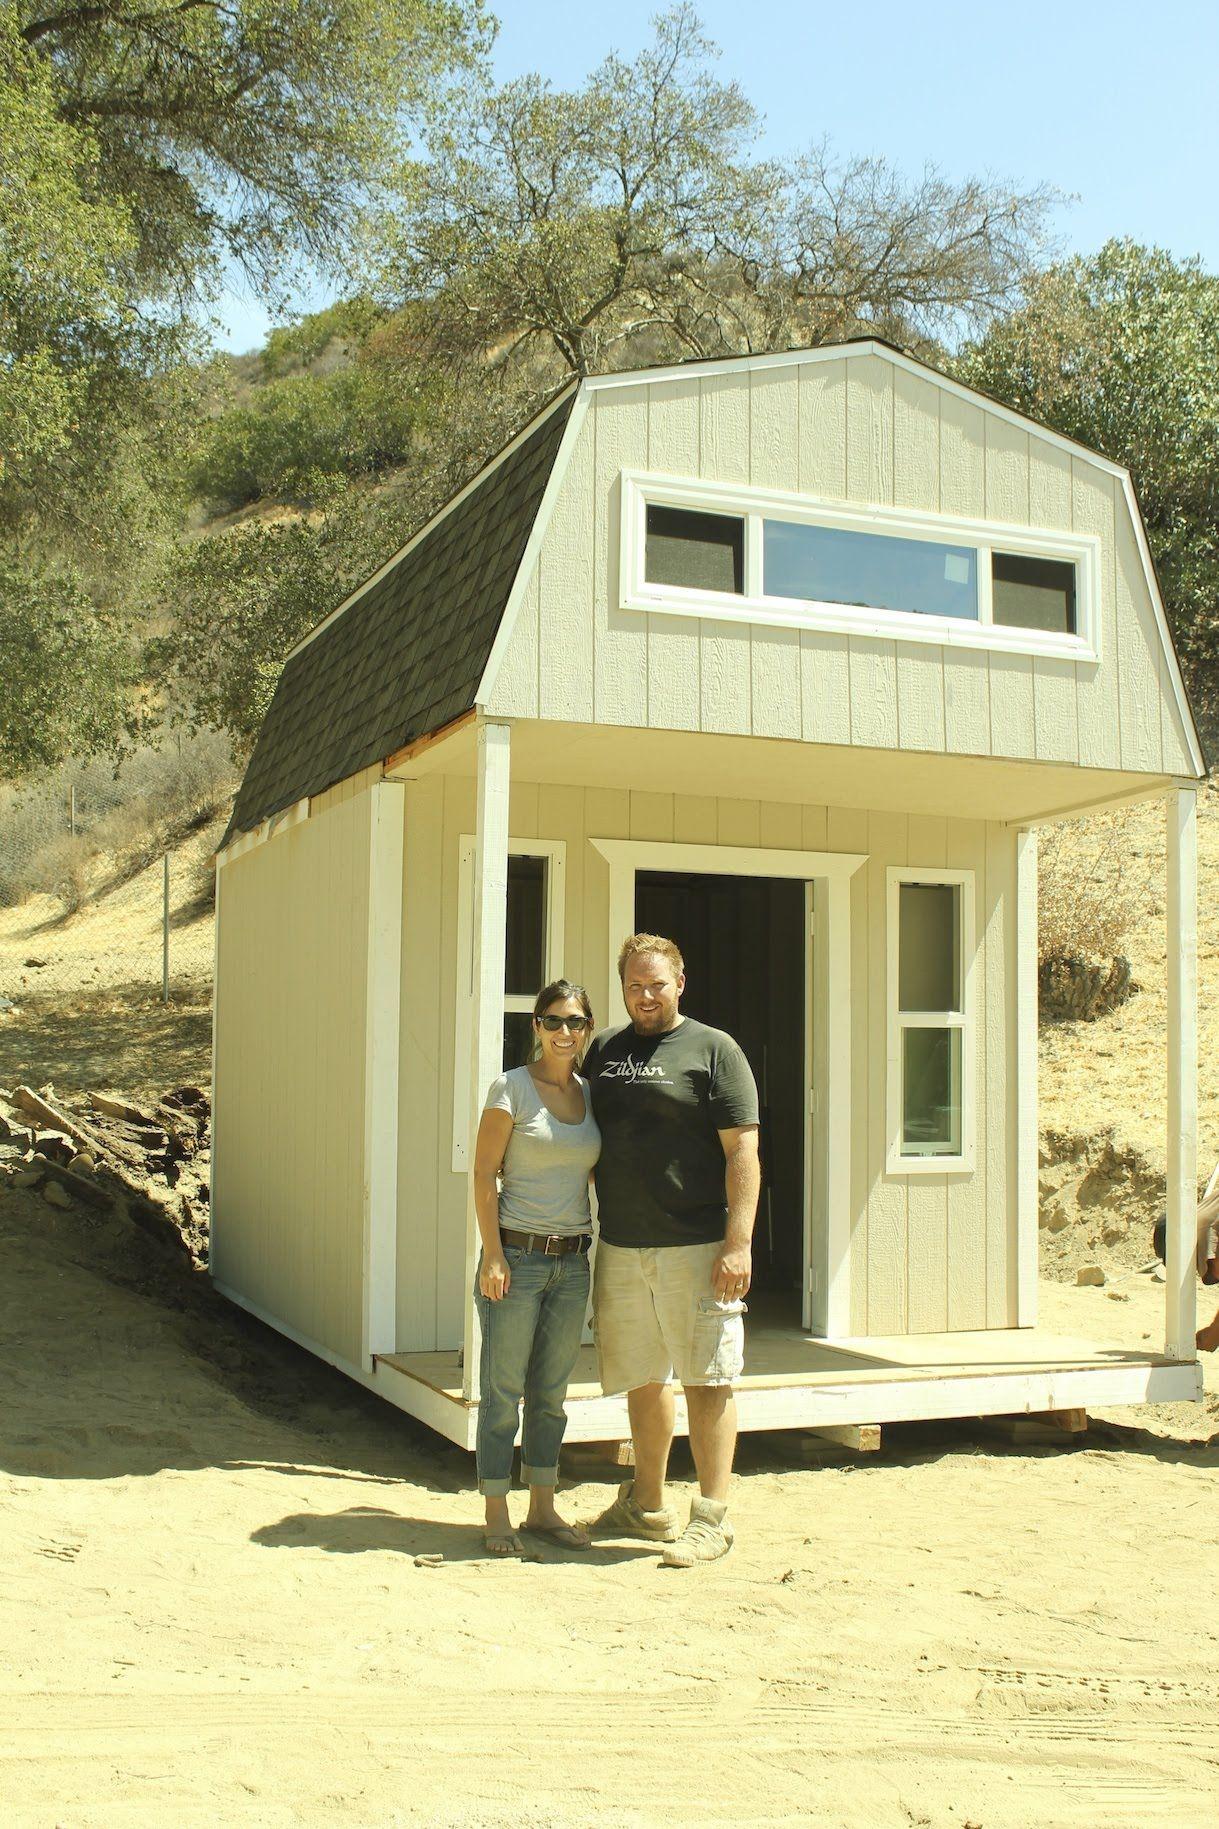 Tiny home for family of 5 - Family Of 5 850 Sq Ft Tiny House Sliding Bathroom Door